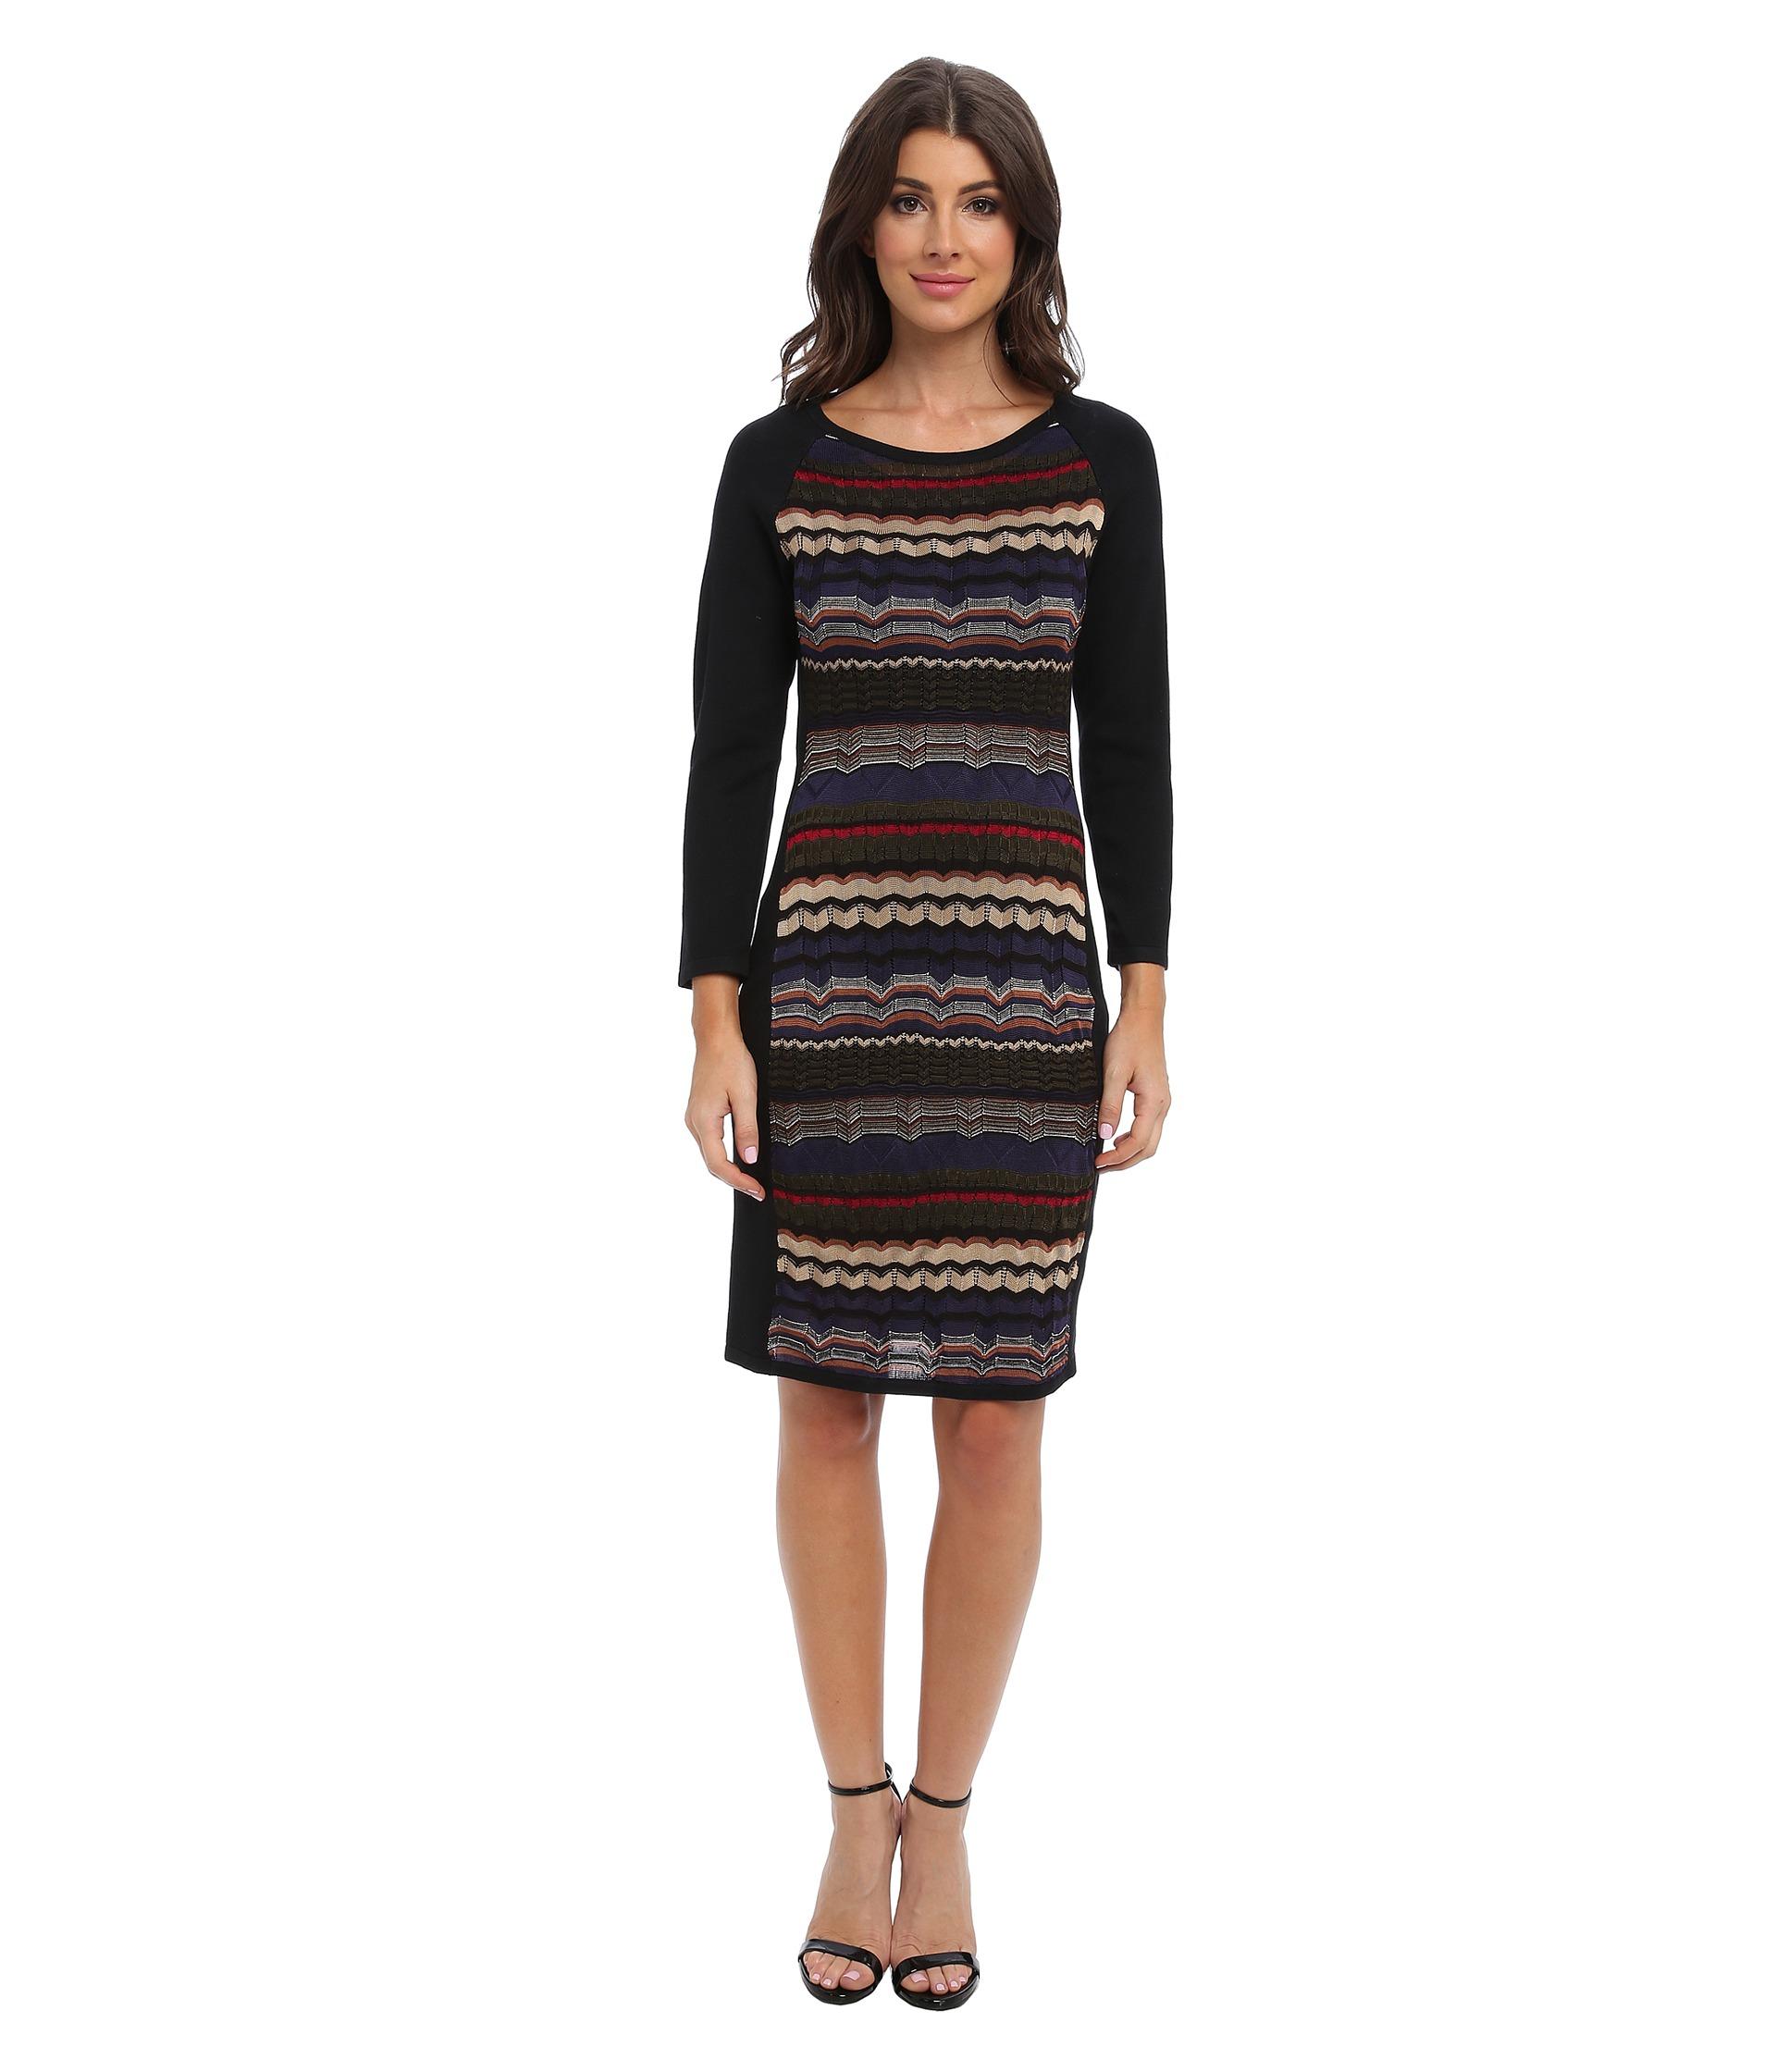 Laundry by shelli segal Multi Stitch Sweater Dress in ...